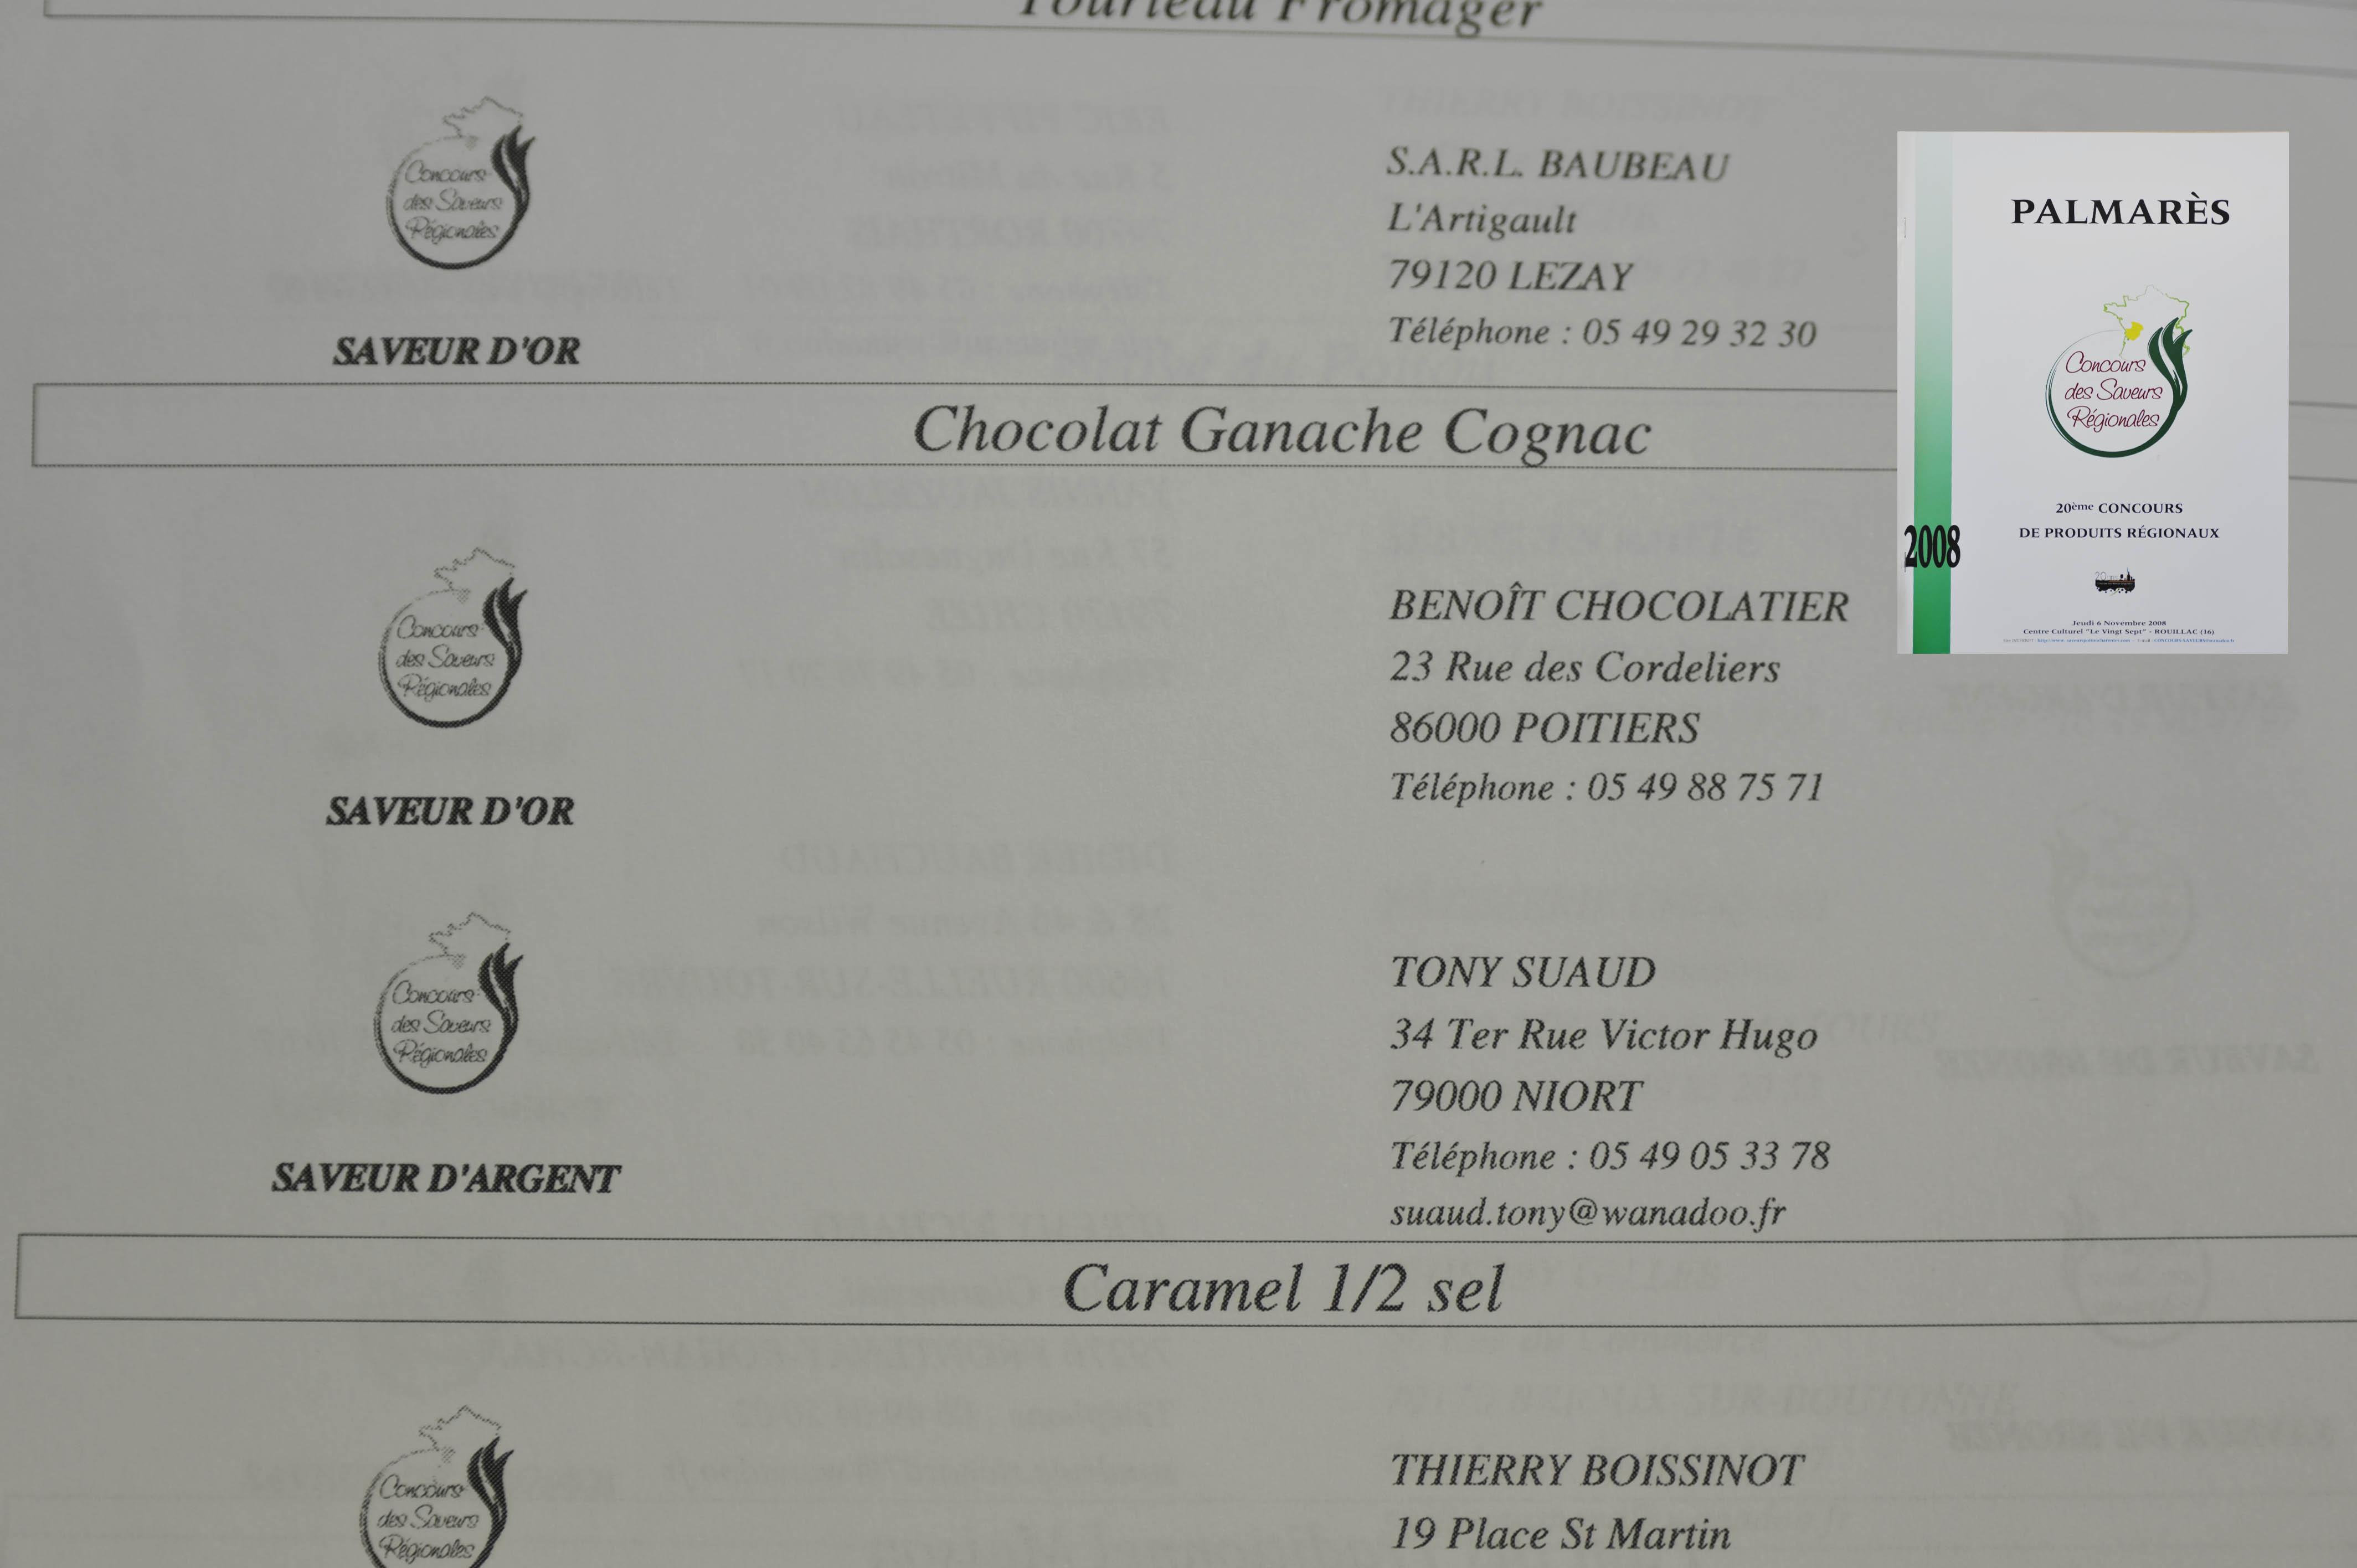 benoit chocolatier  concours  distinctions